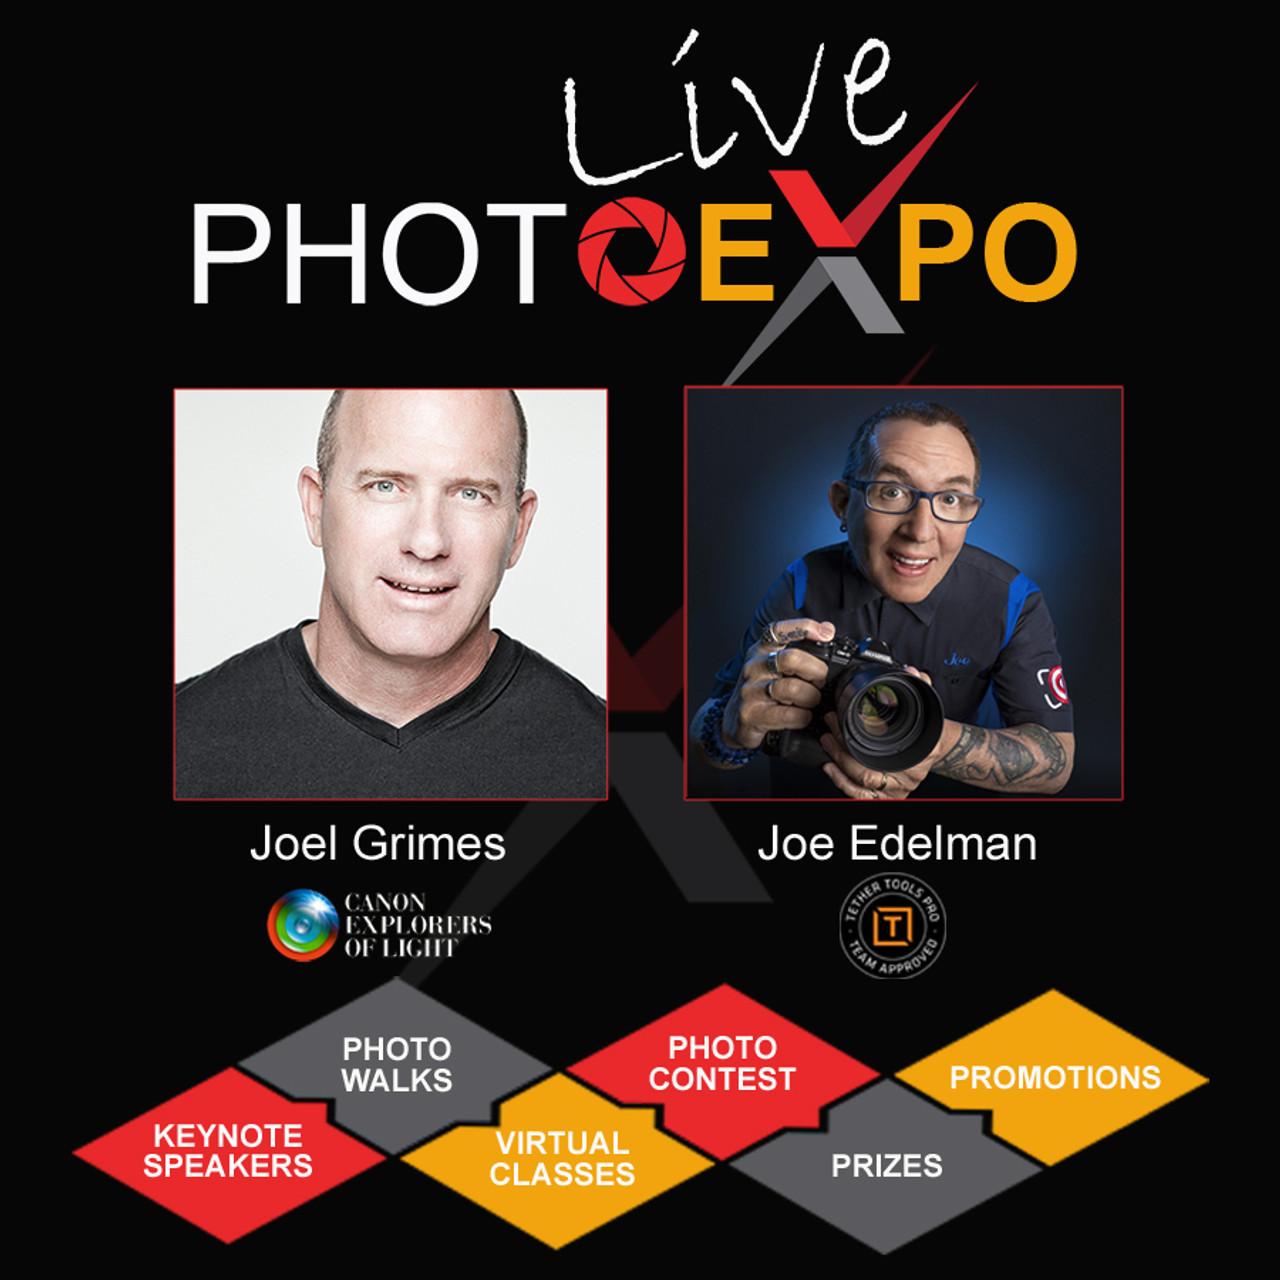 Photo Expo Live 2021 | Little Rock | August 12-14, 2021